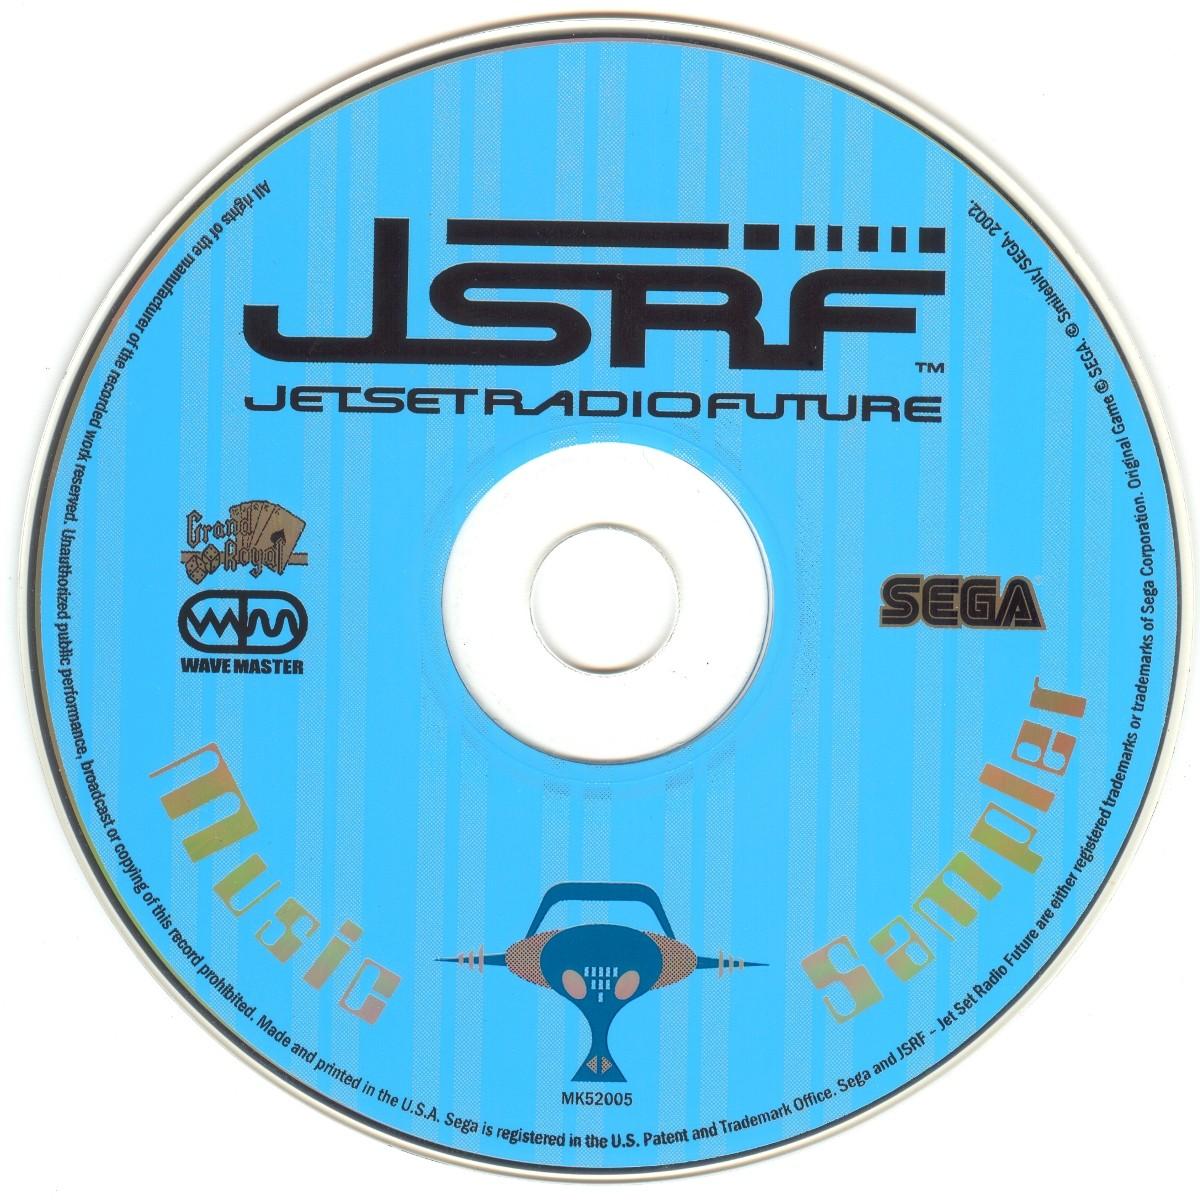 Jet-Set-Radio-Future-Music-Sampler-cd-disc.jpg